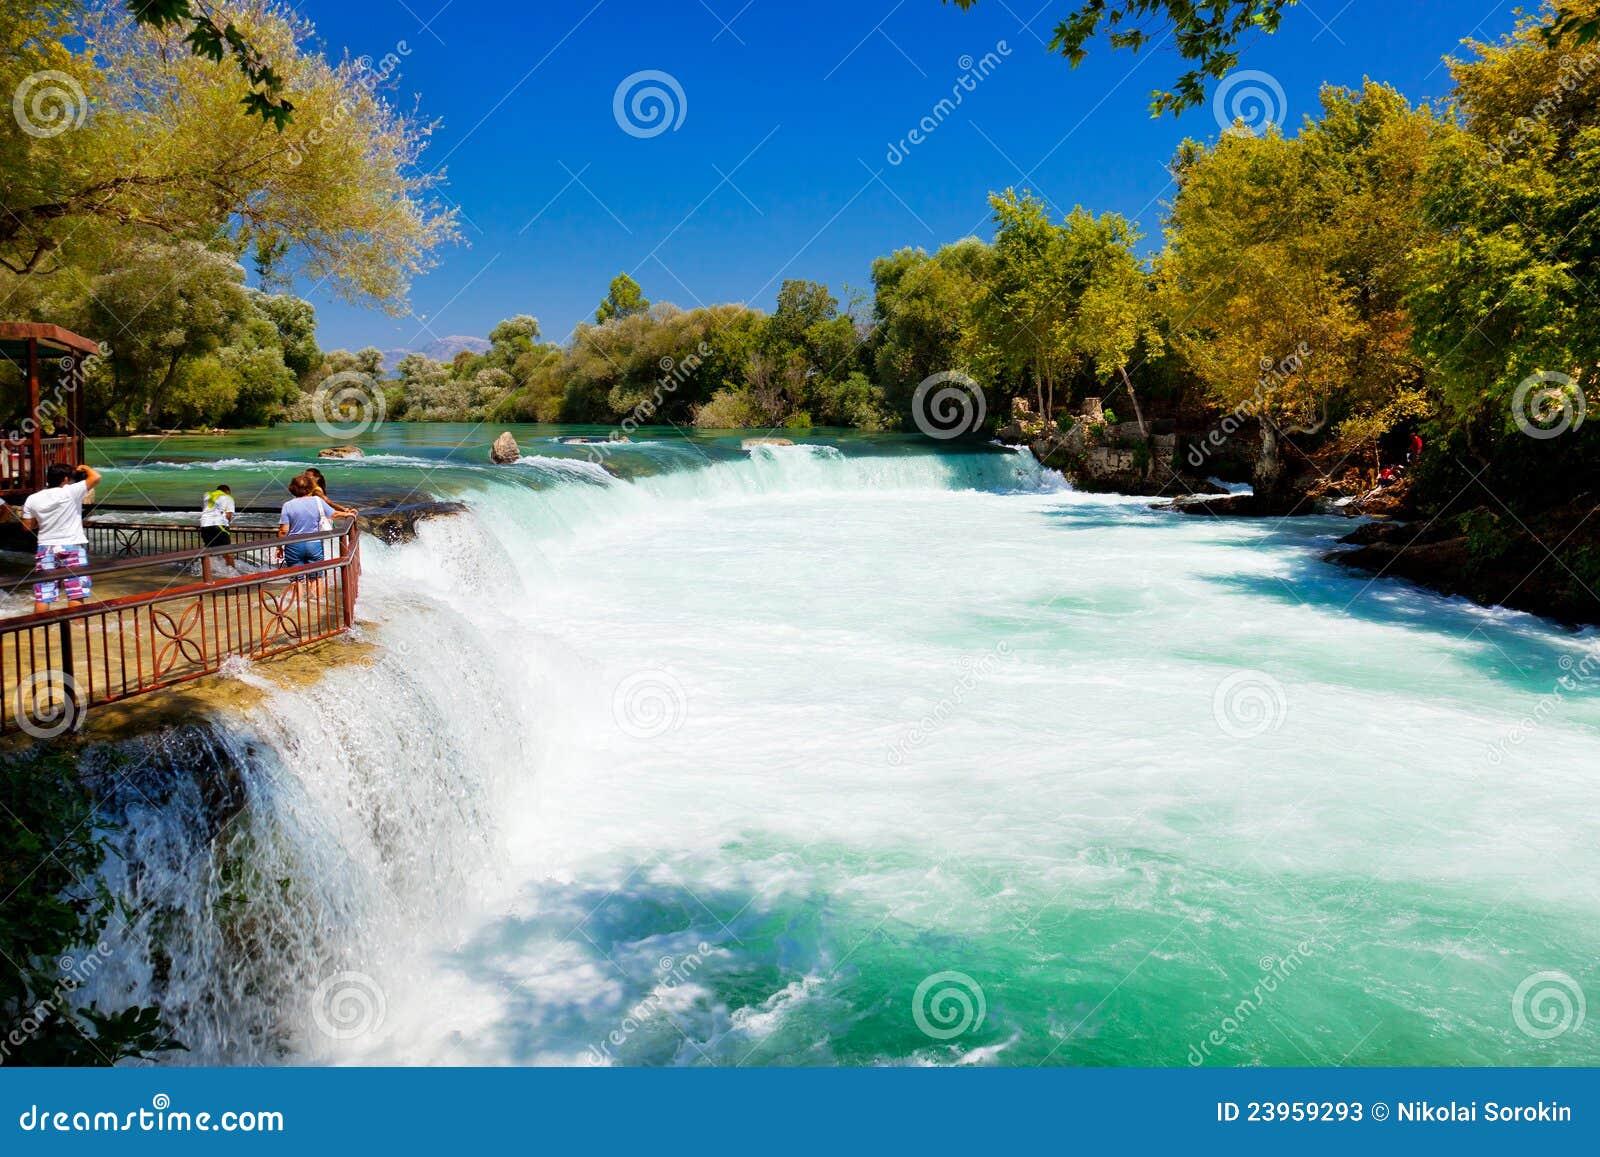 Manavgat Turkey  city images : waterfall manavgat turkey 23959293